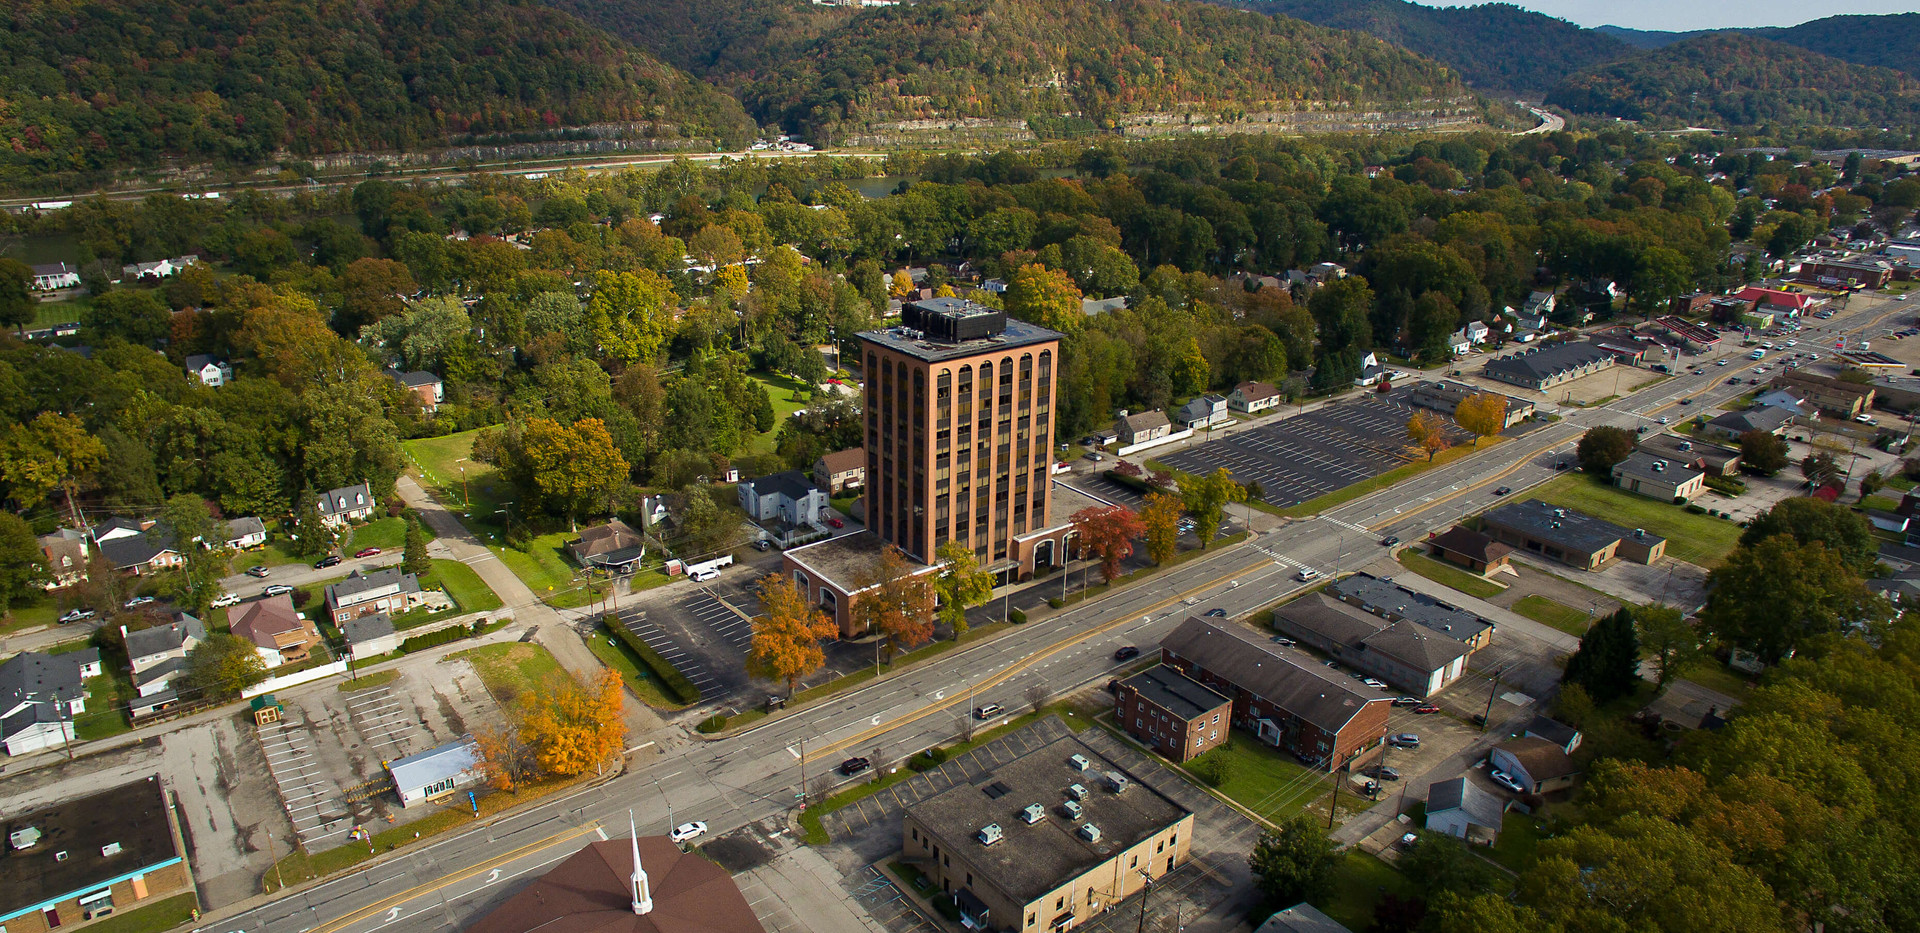 City Center East - Aerial View